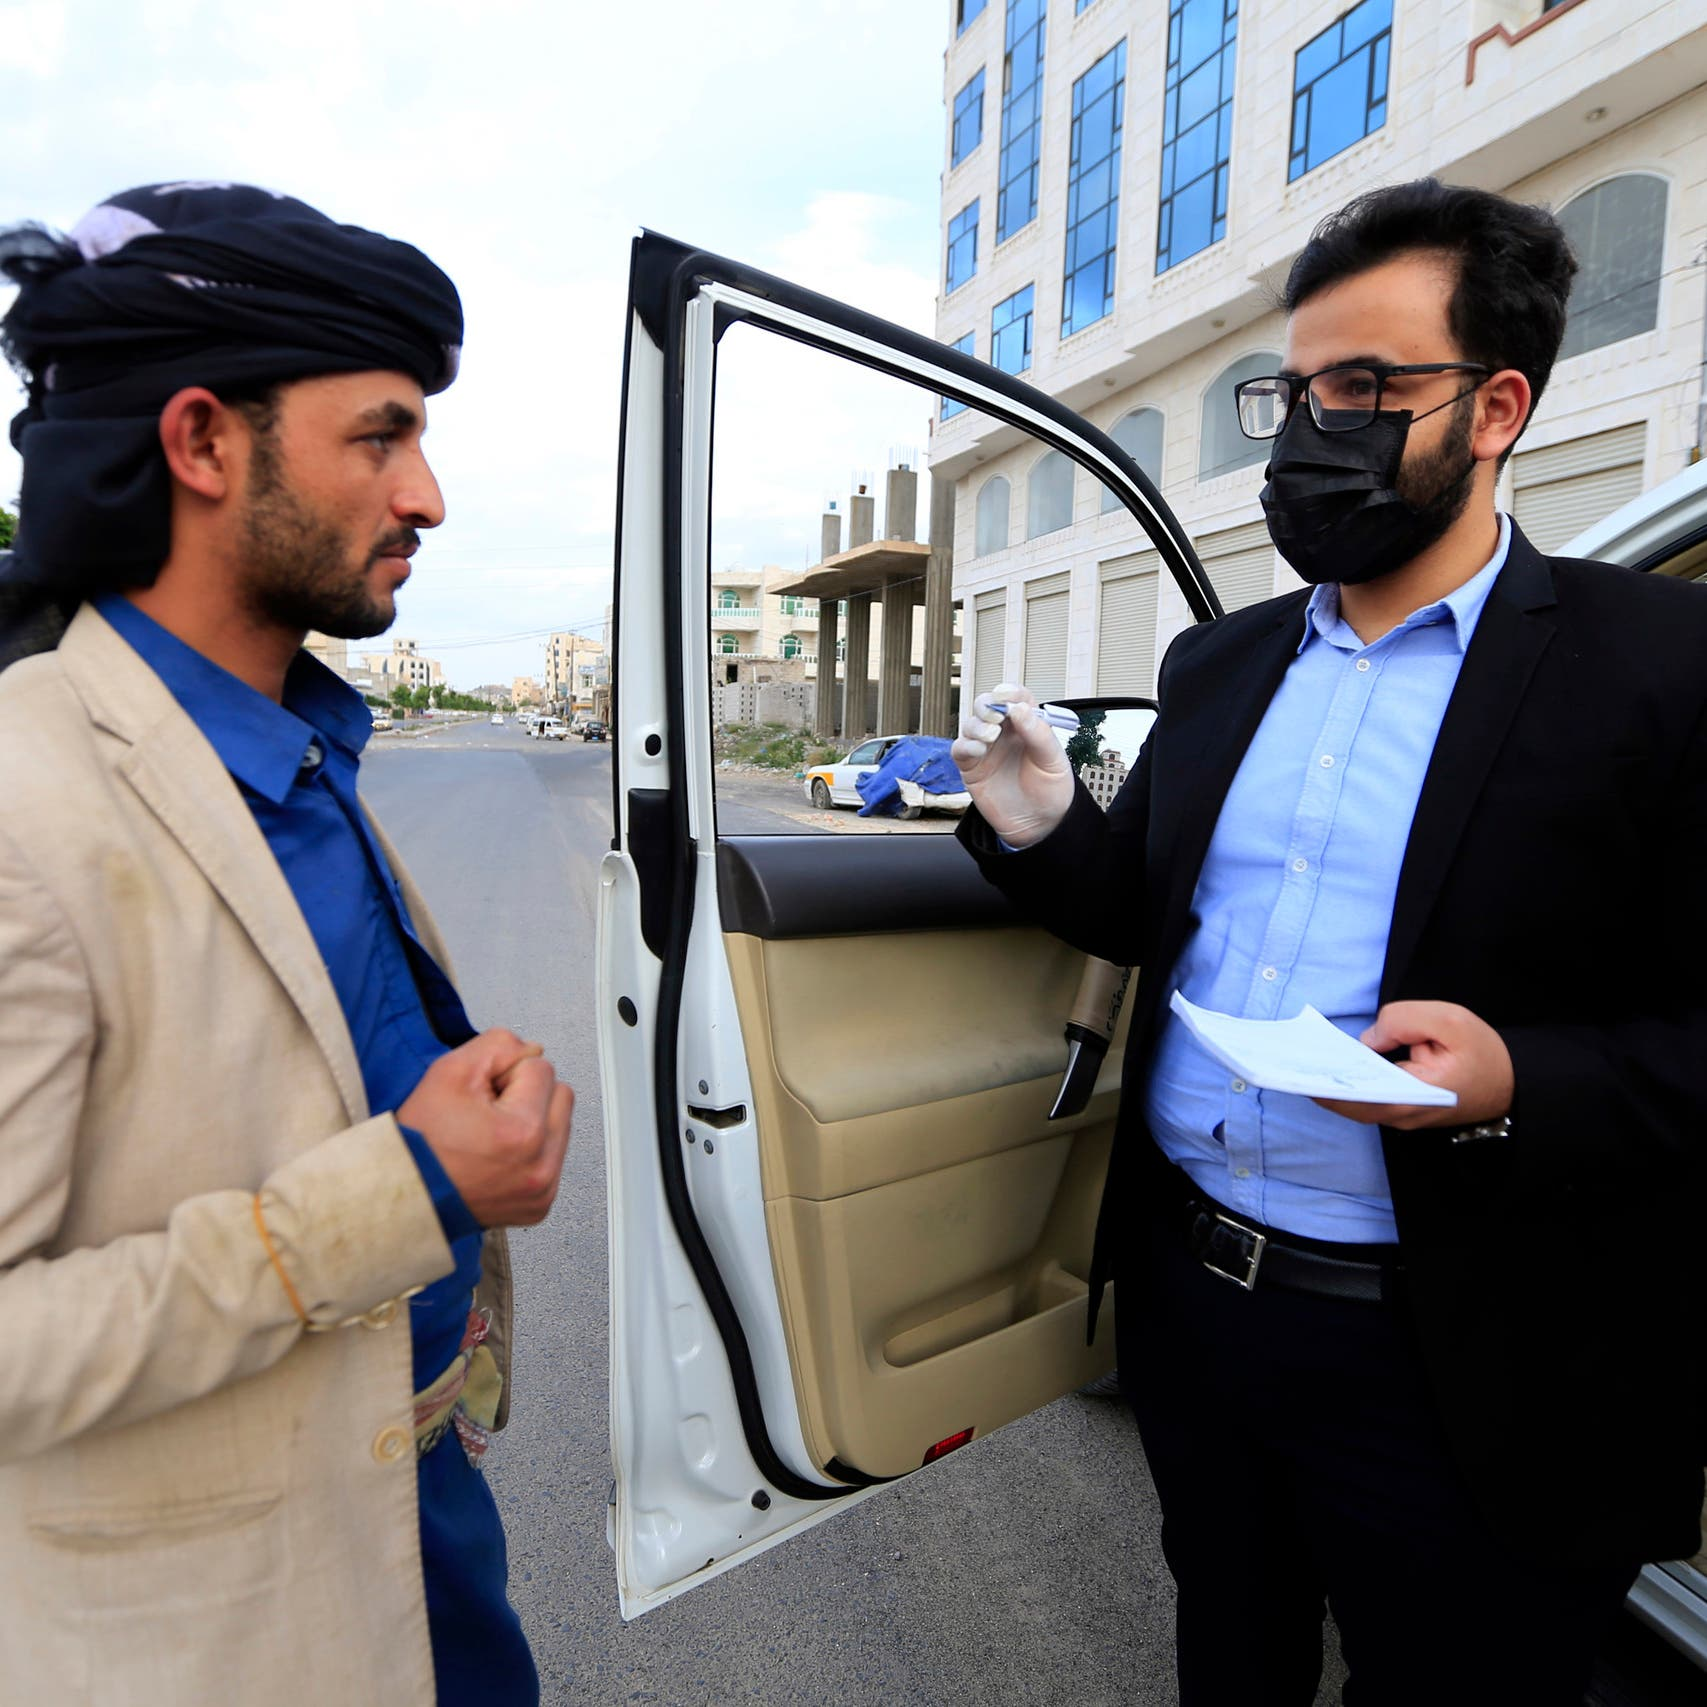 Yemeni doctor uses car for medical consultations amid coronavirus